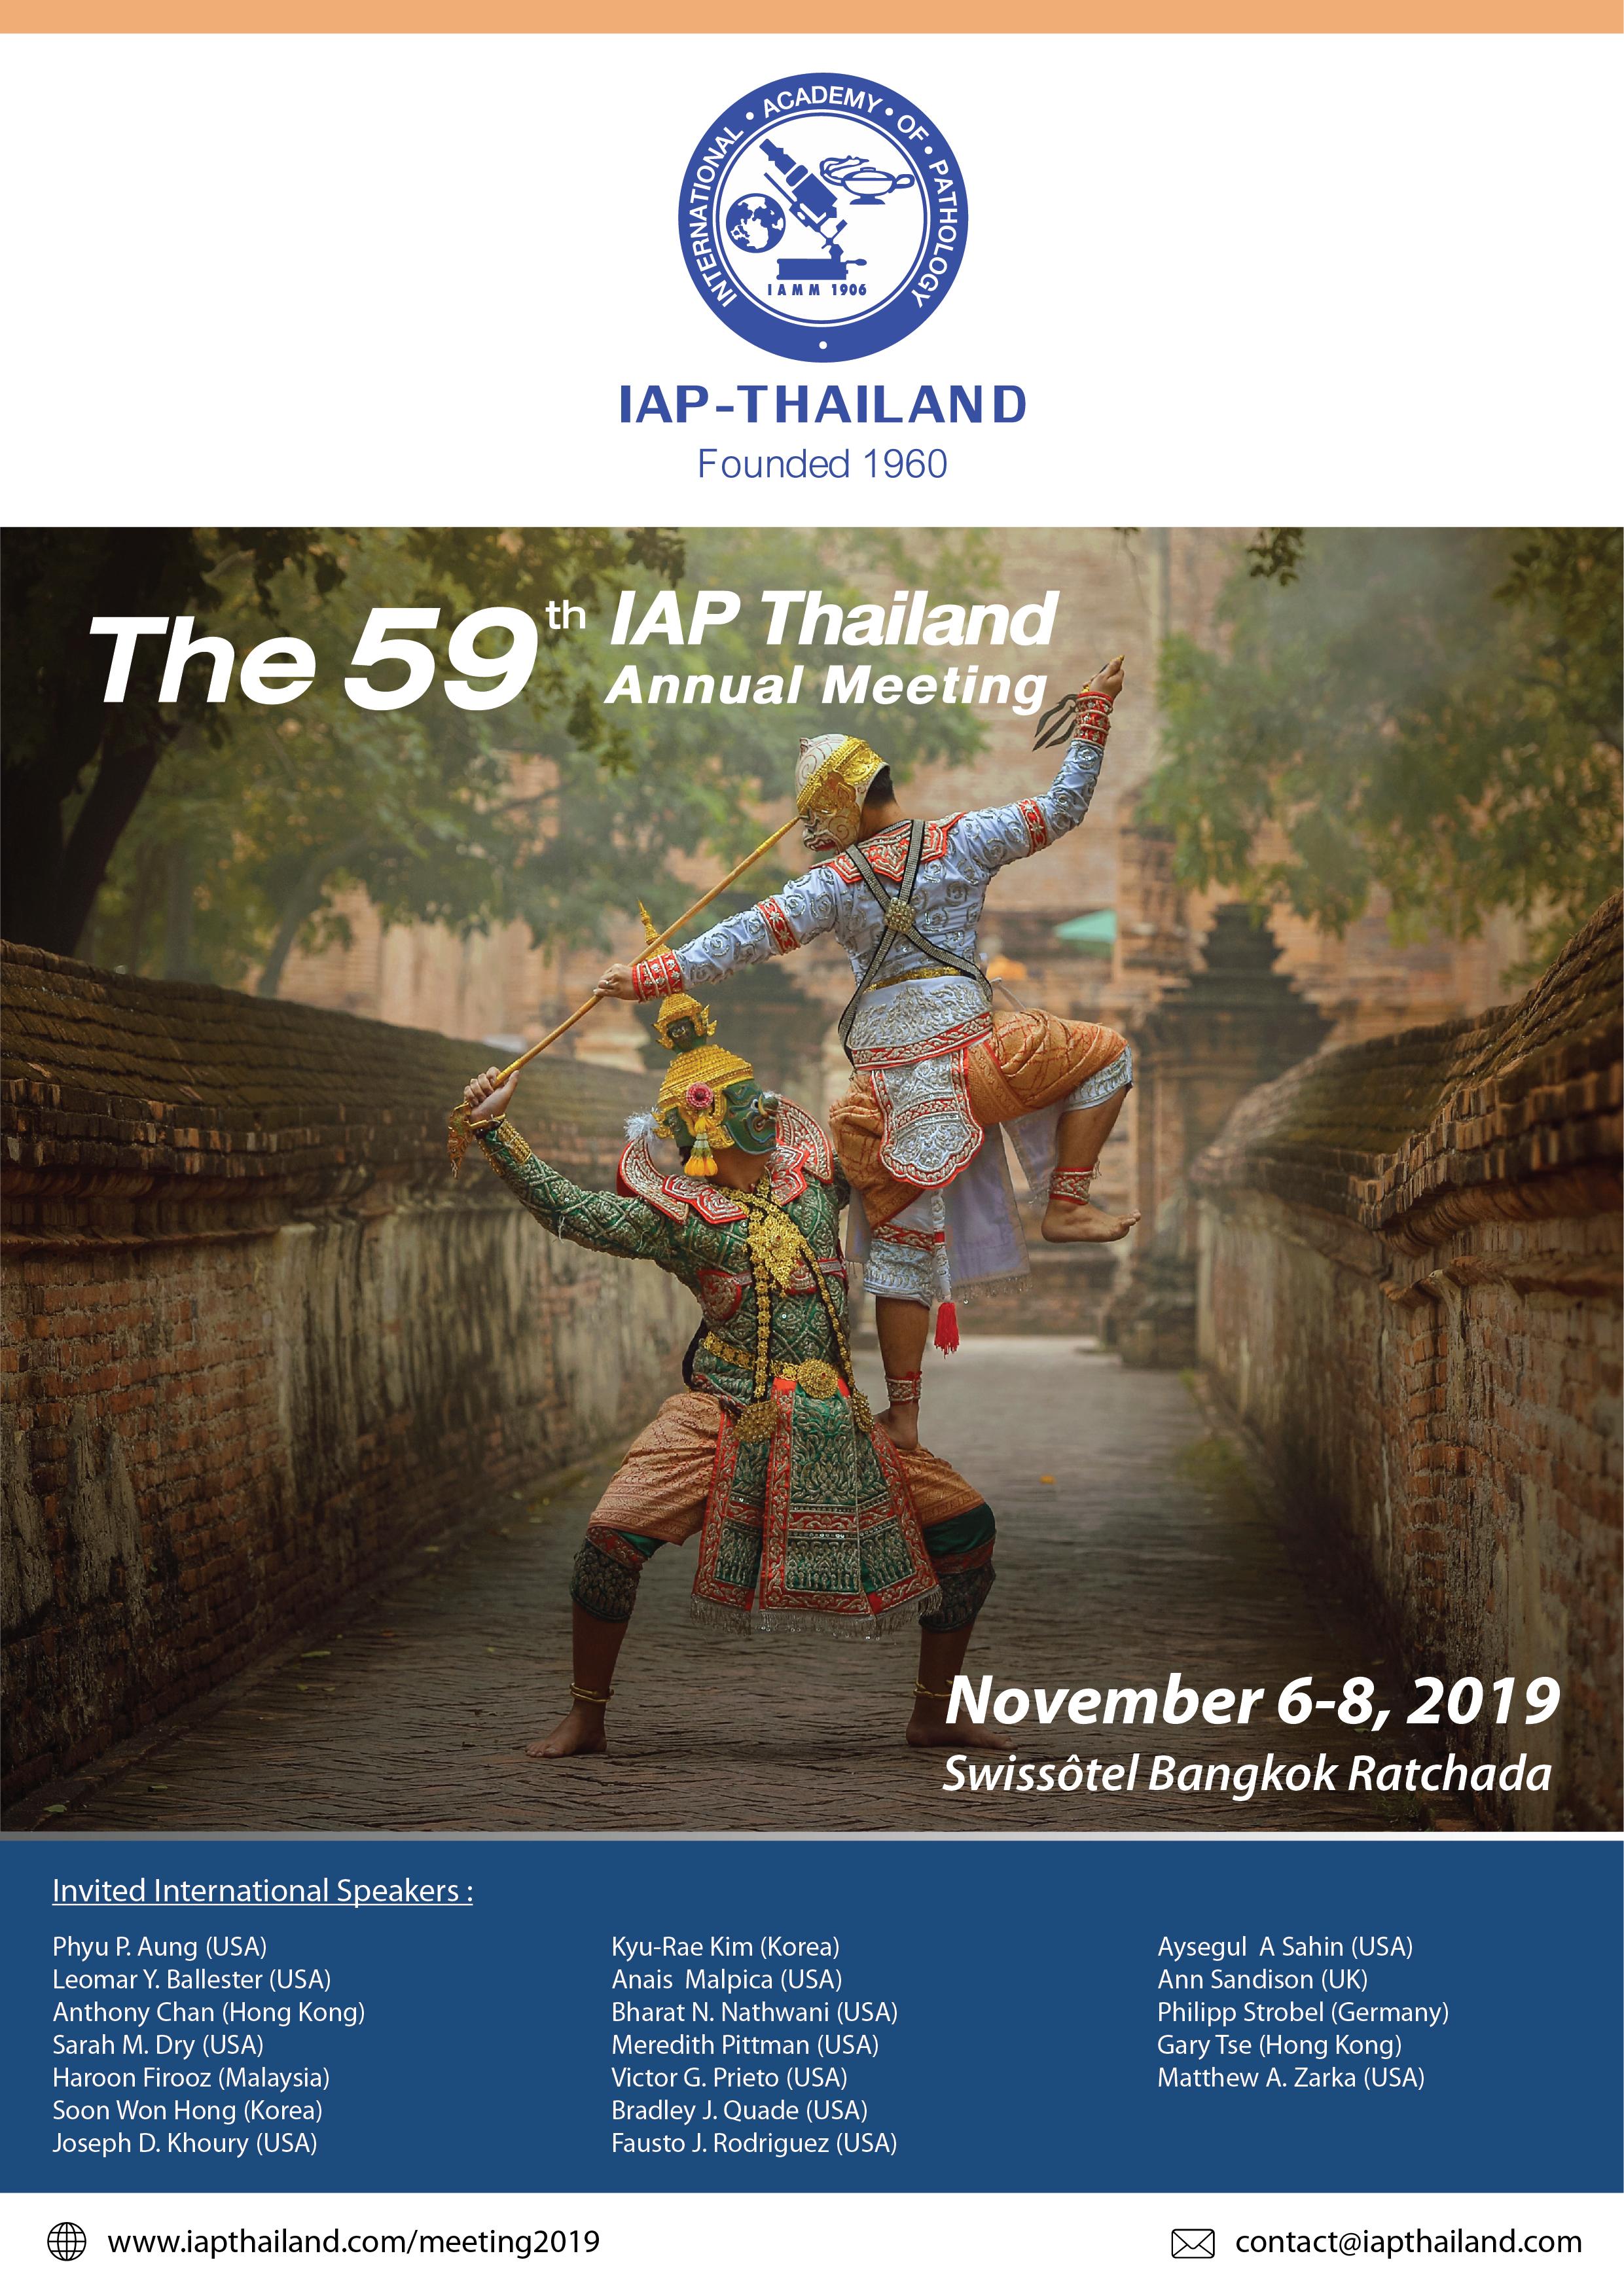 IAP-Thailand Association